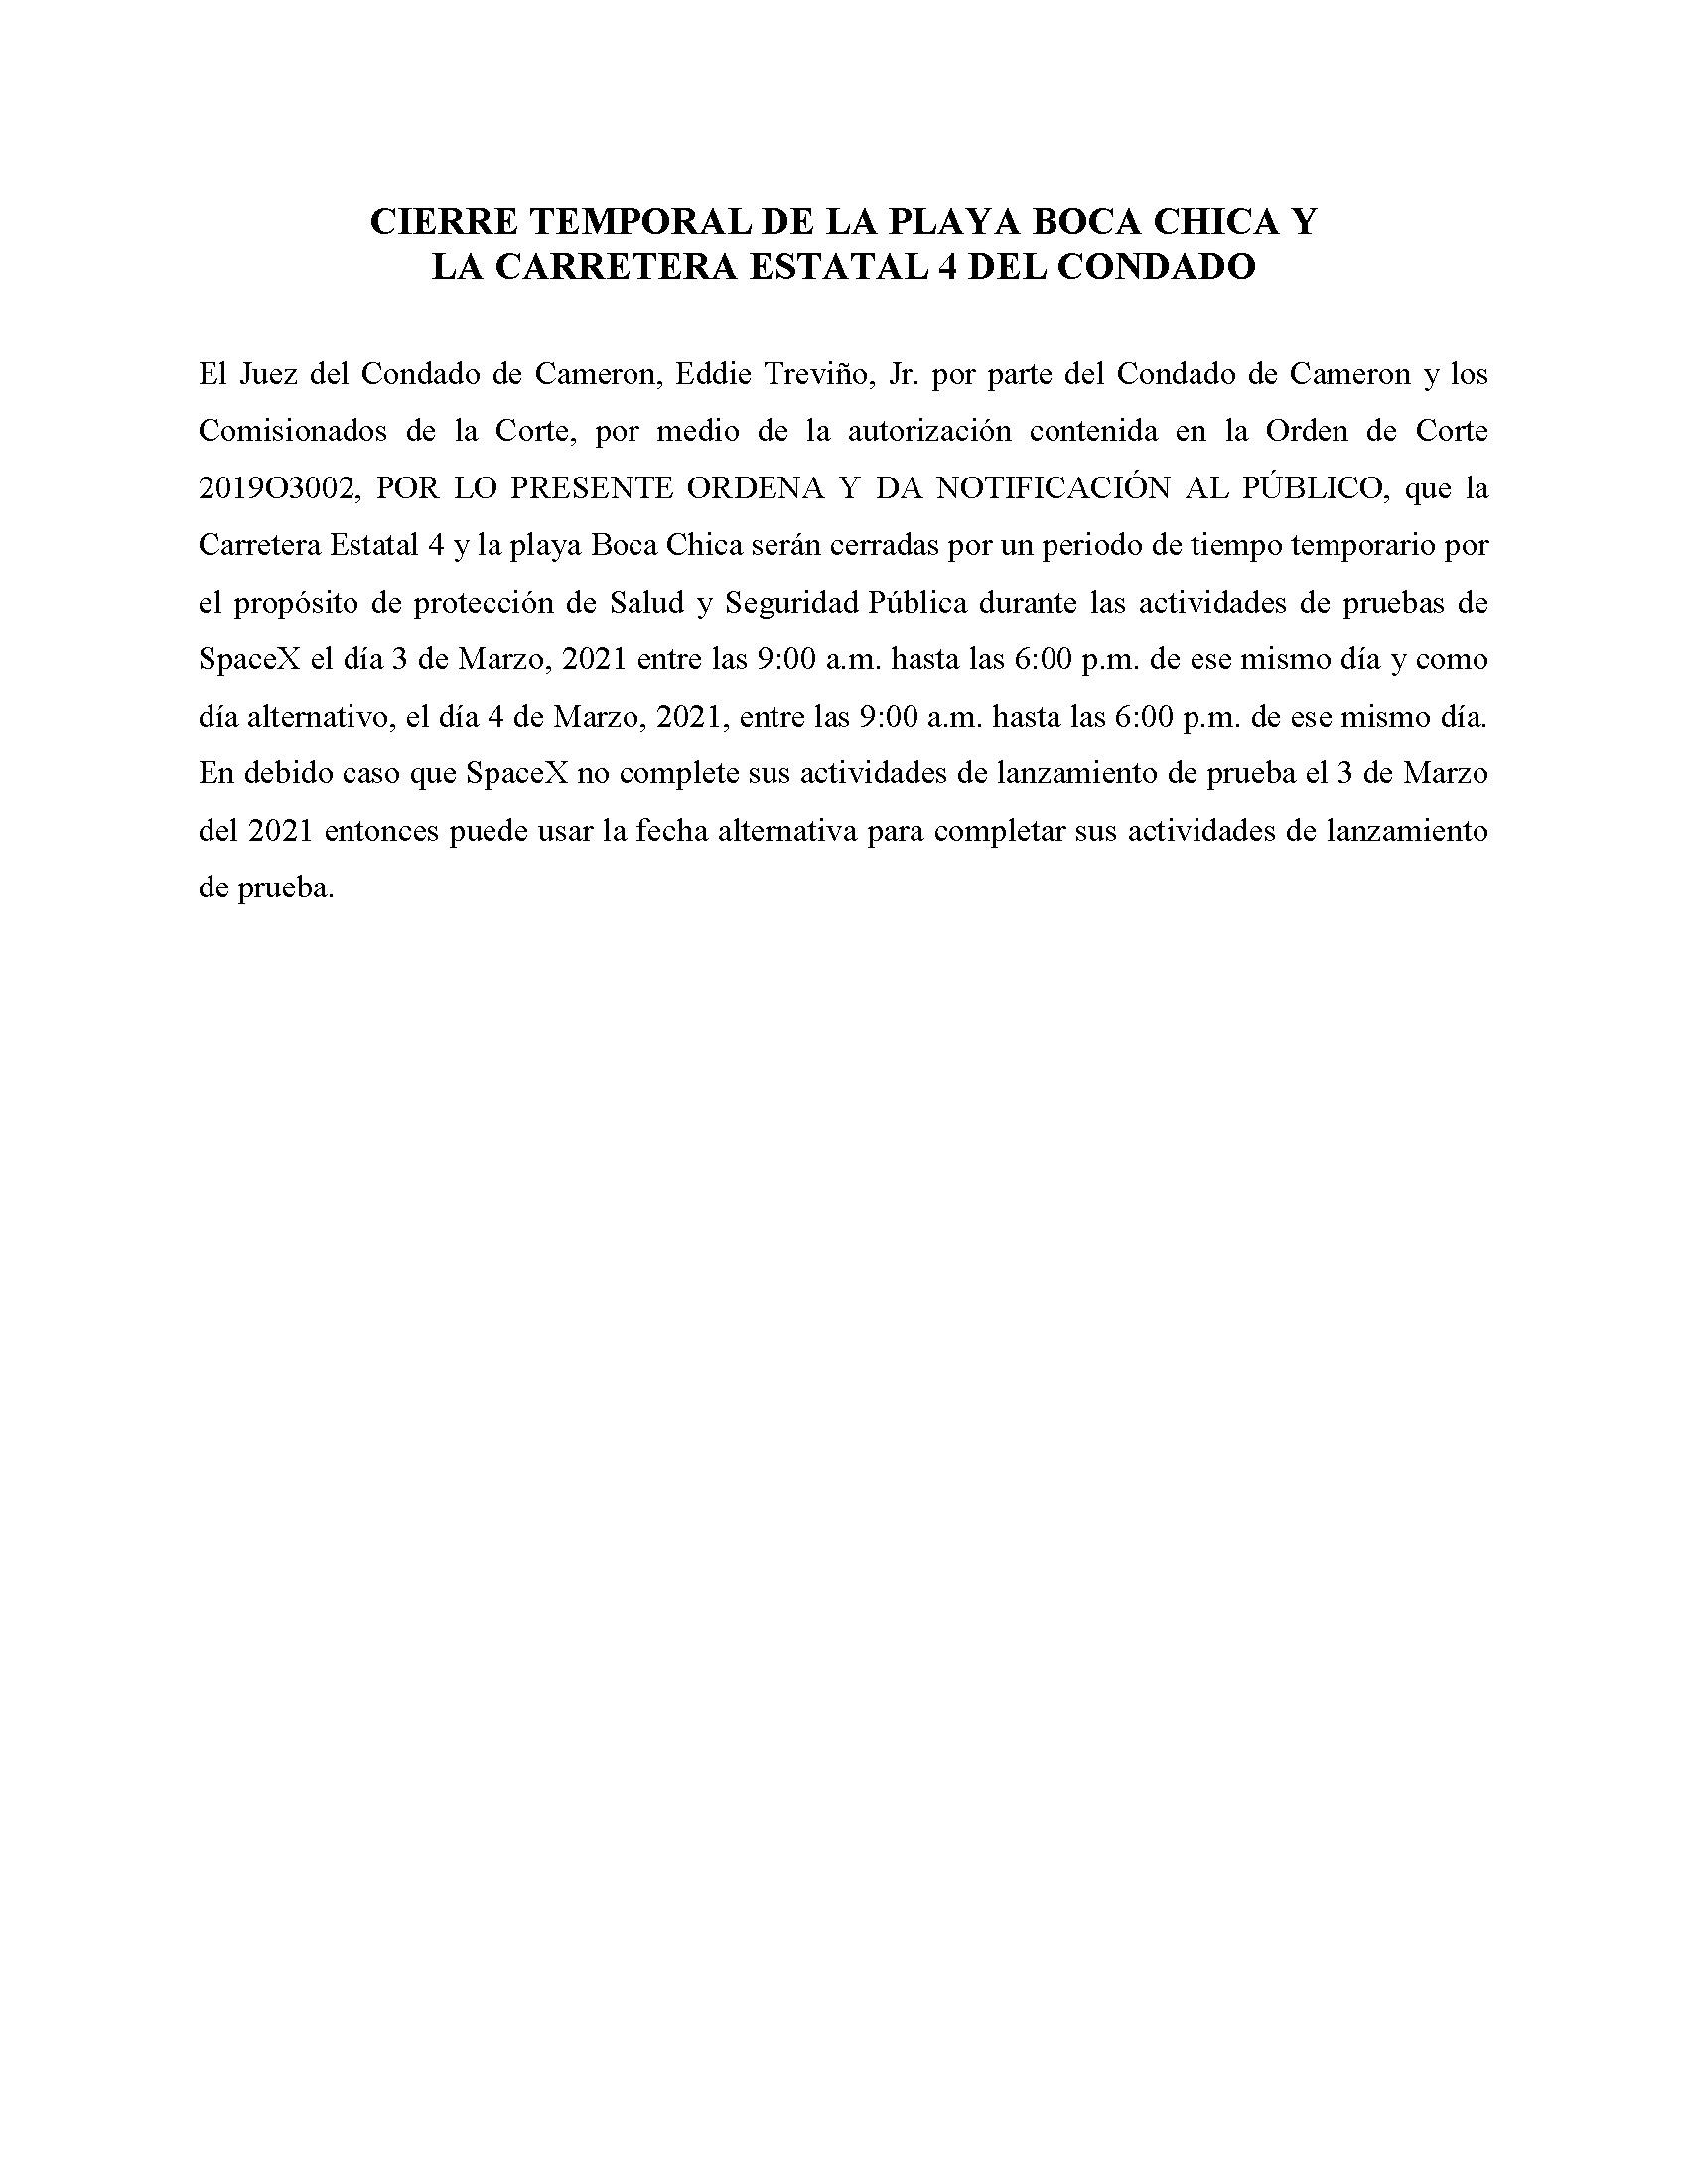 ORDER.CLOSURE OF HIGHWAY 4 Y LA PLAYA BOCA CHICA.SPANISH.03.03.2021